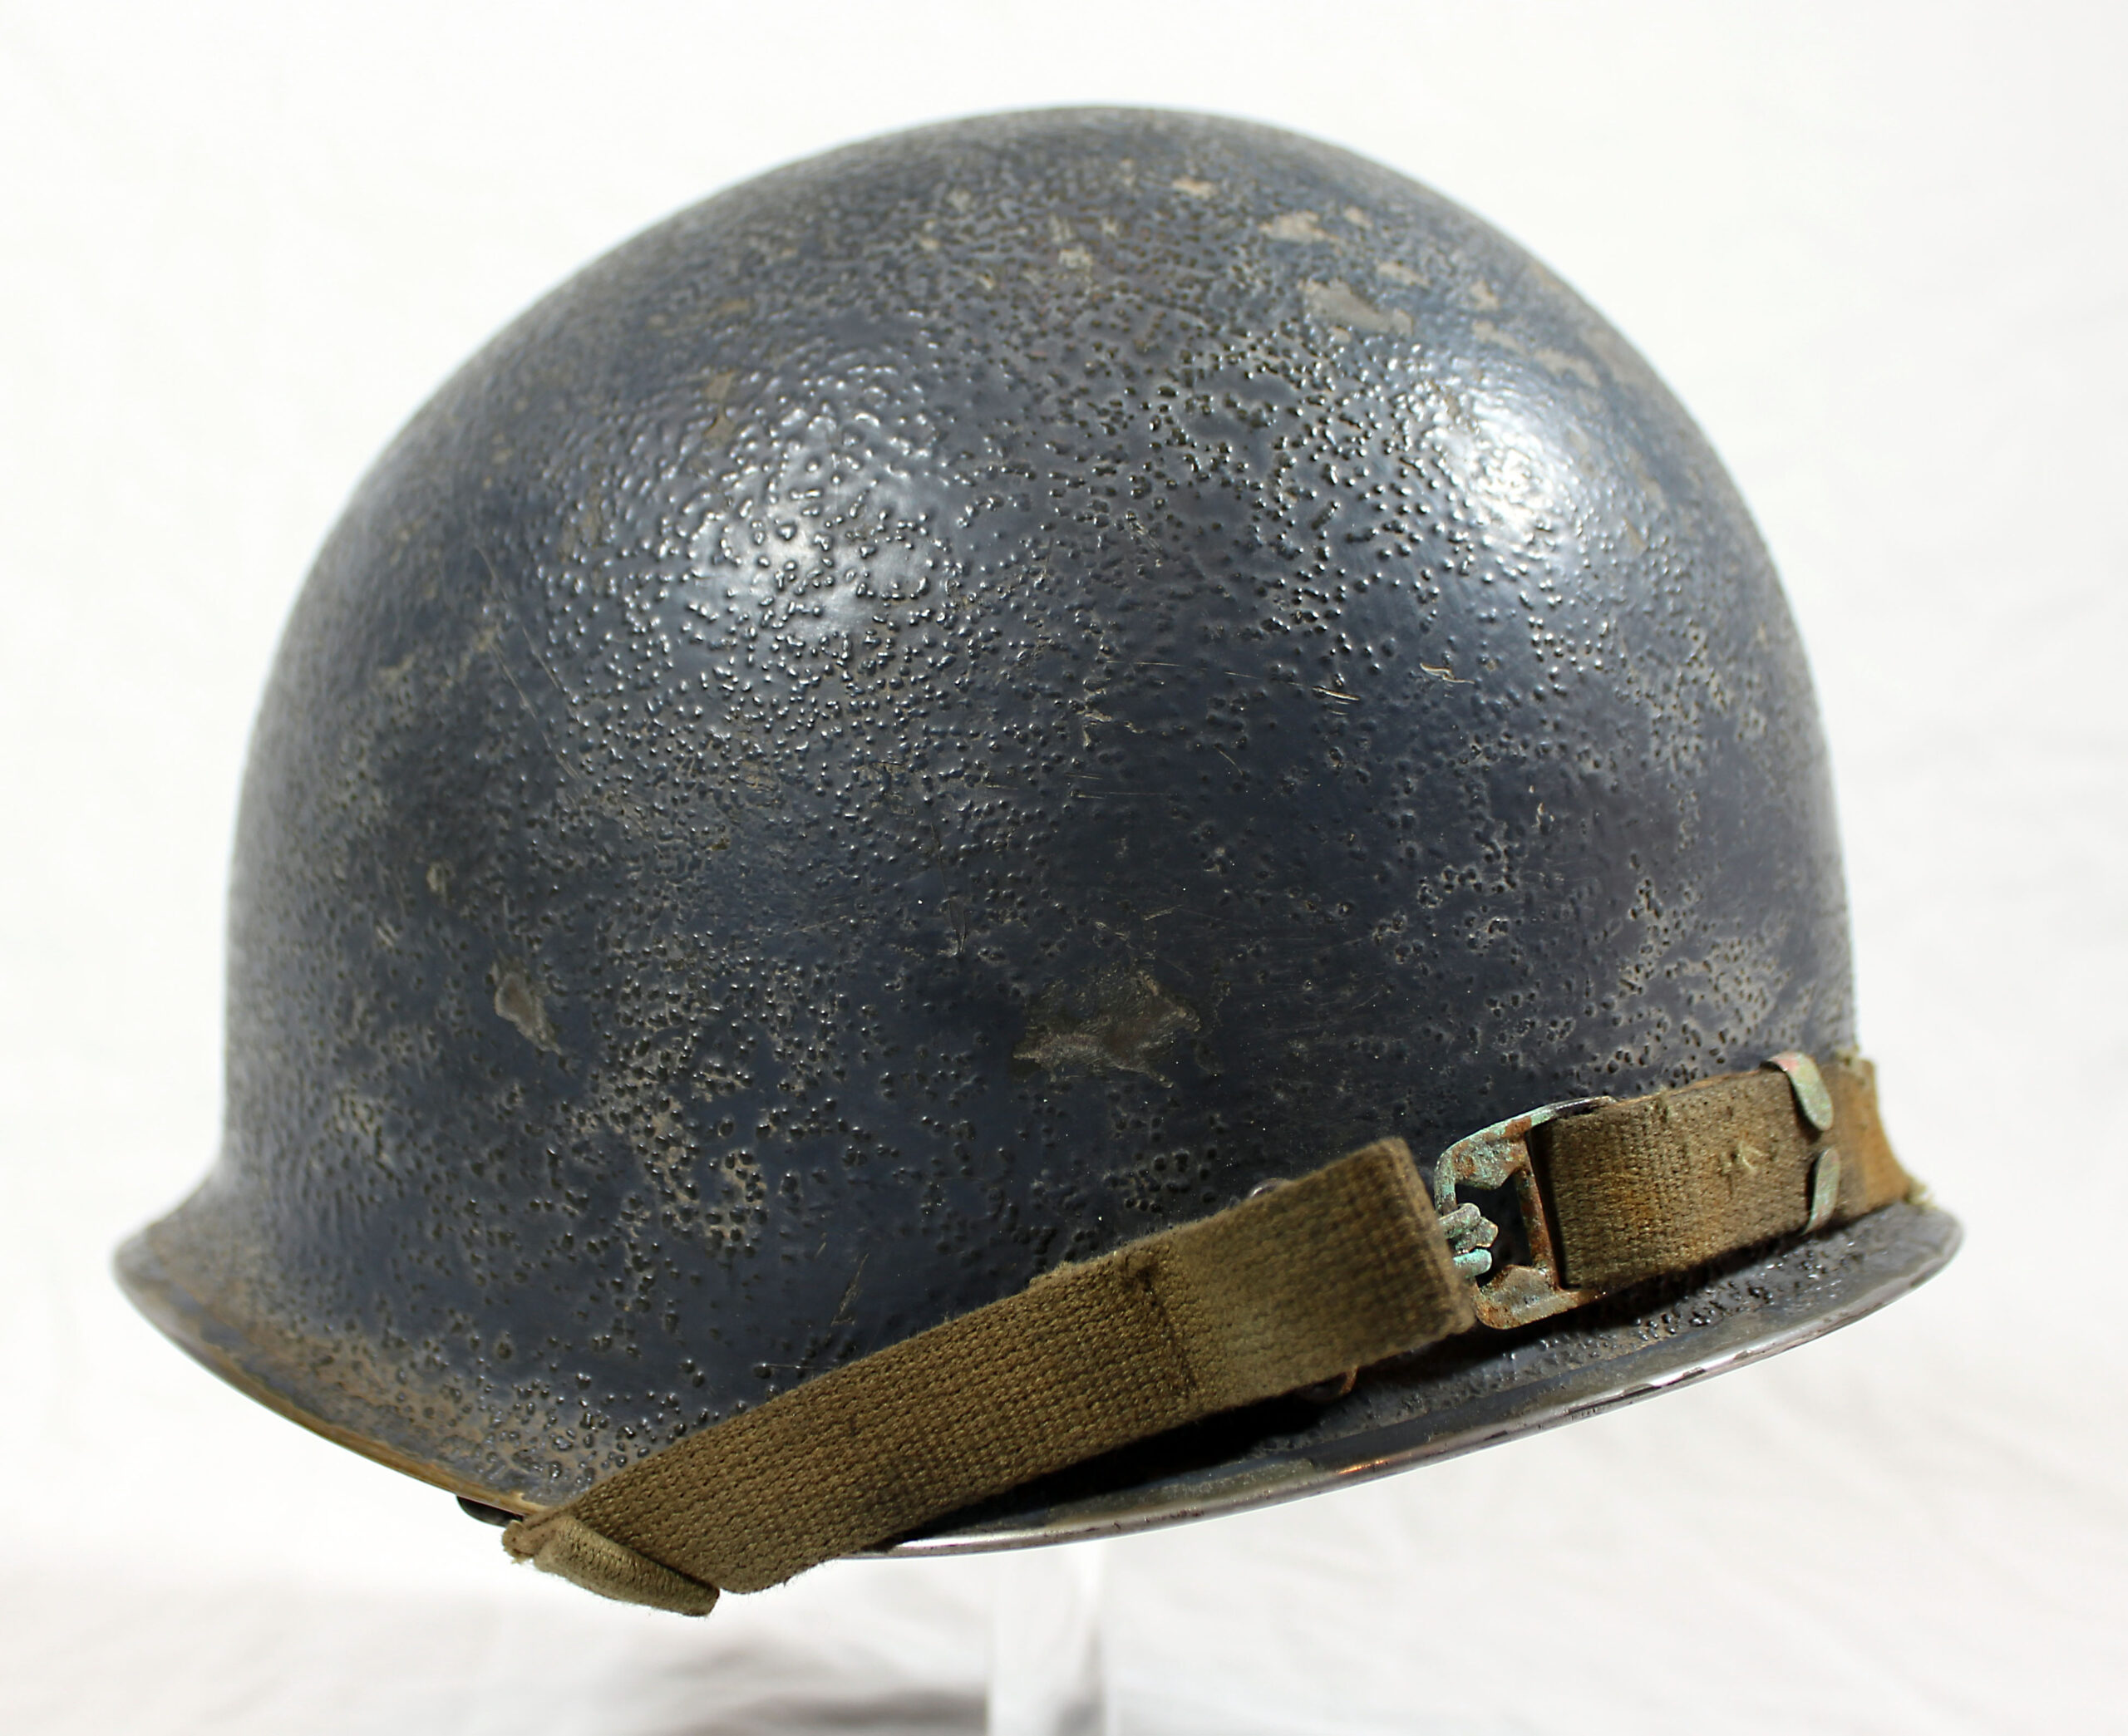 A Navy chaplain's shipboard helmet circa 1942-45